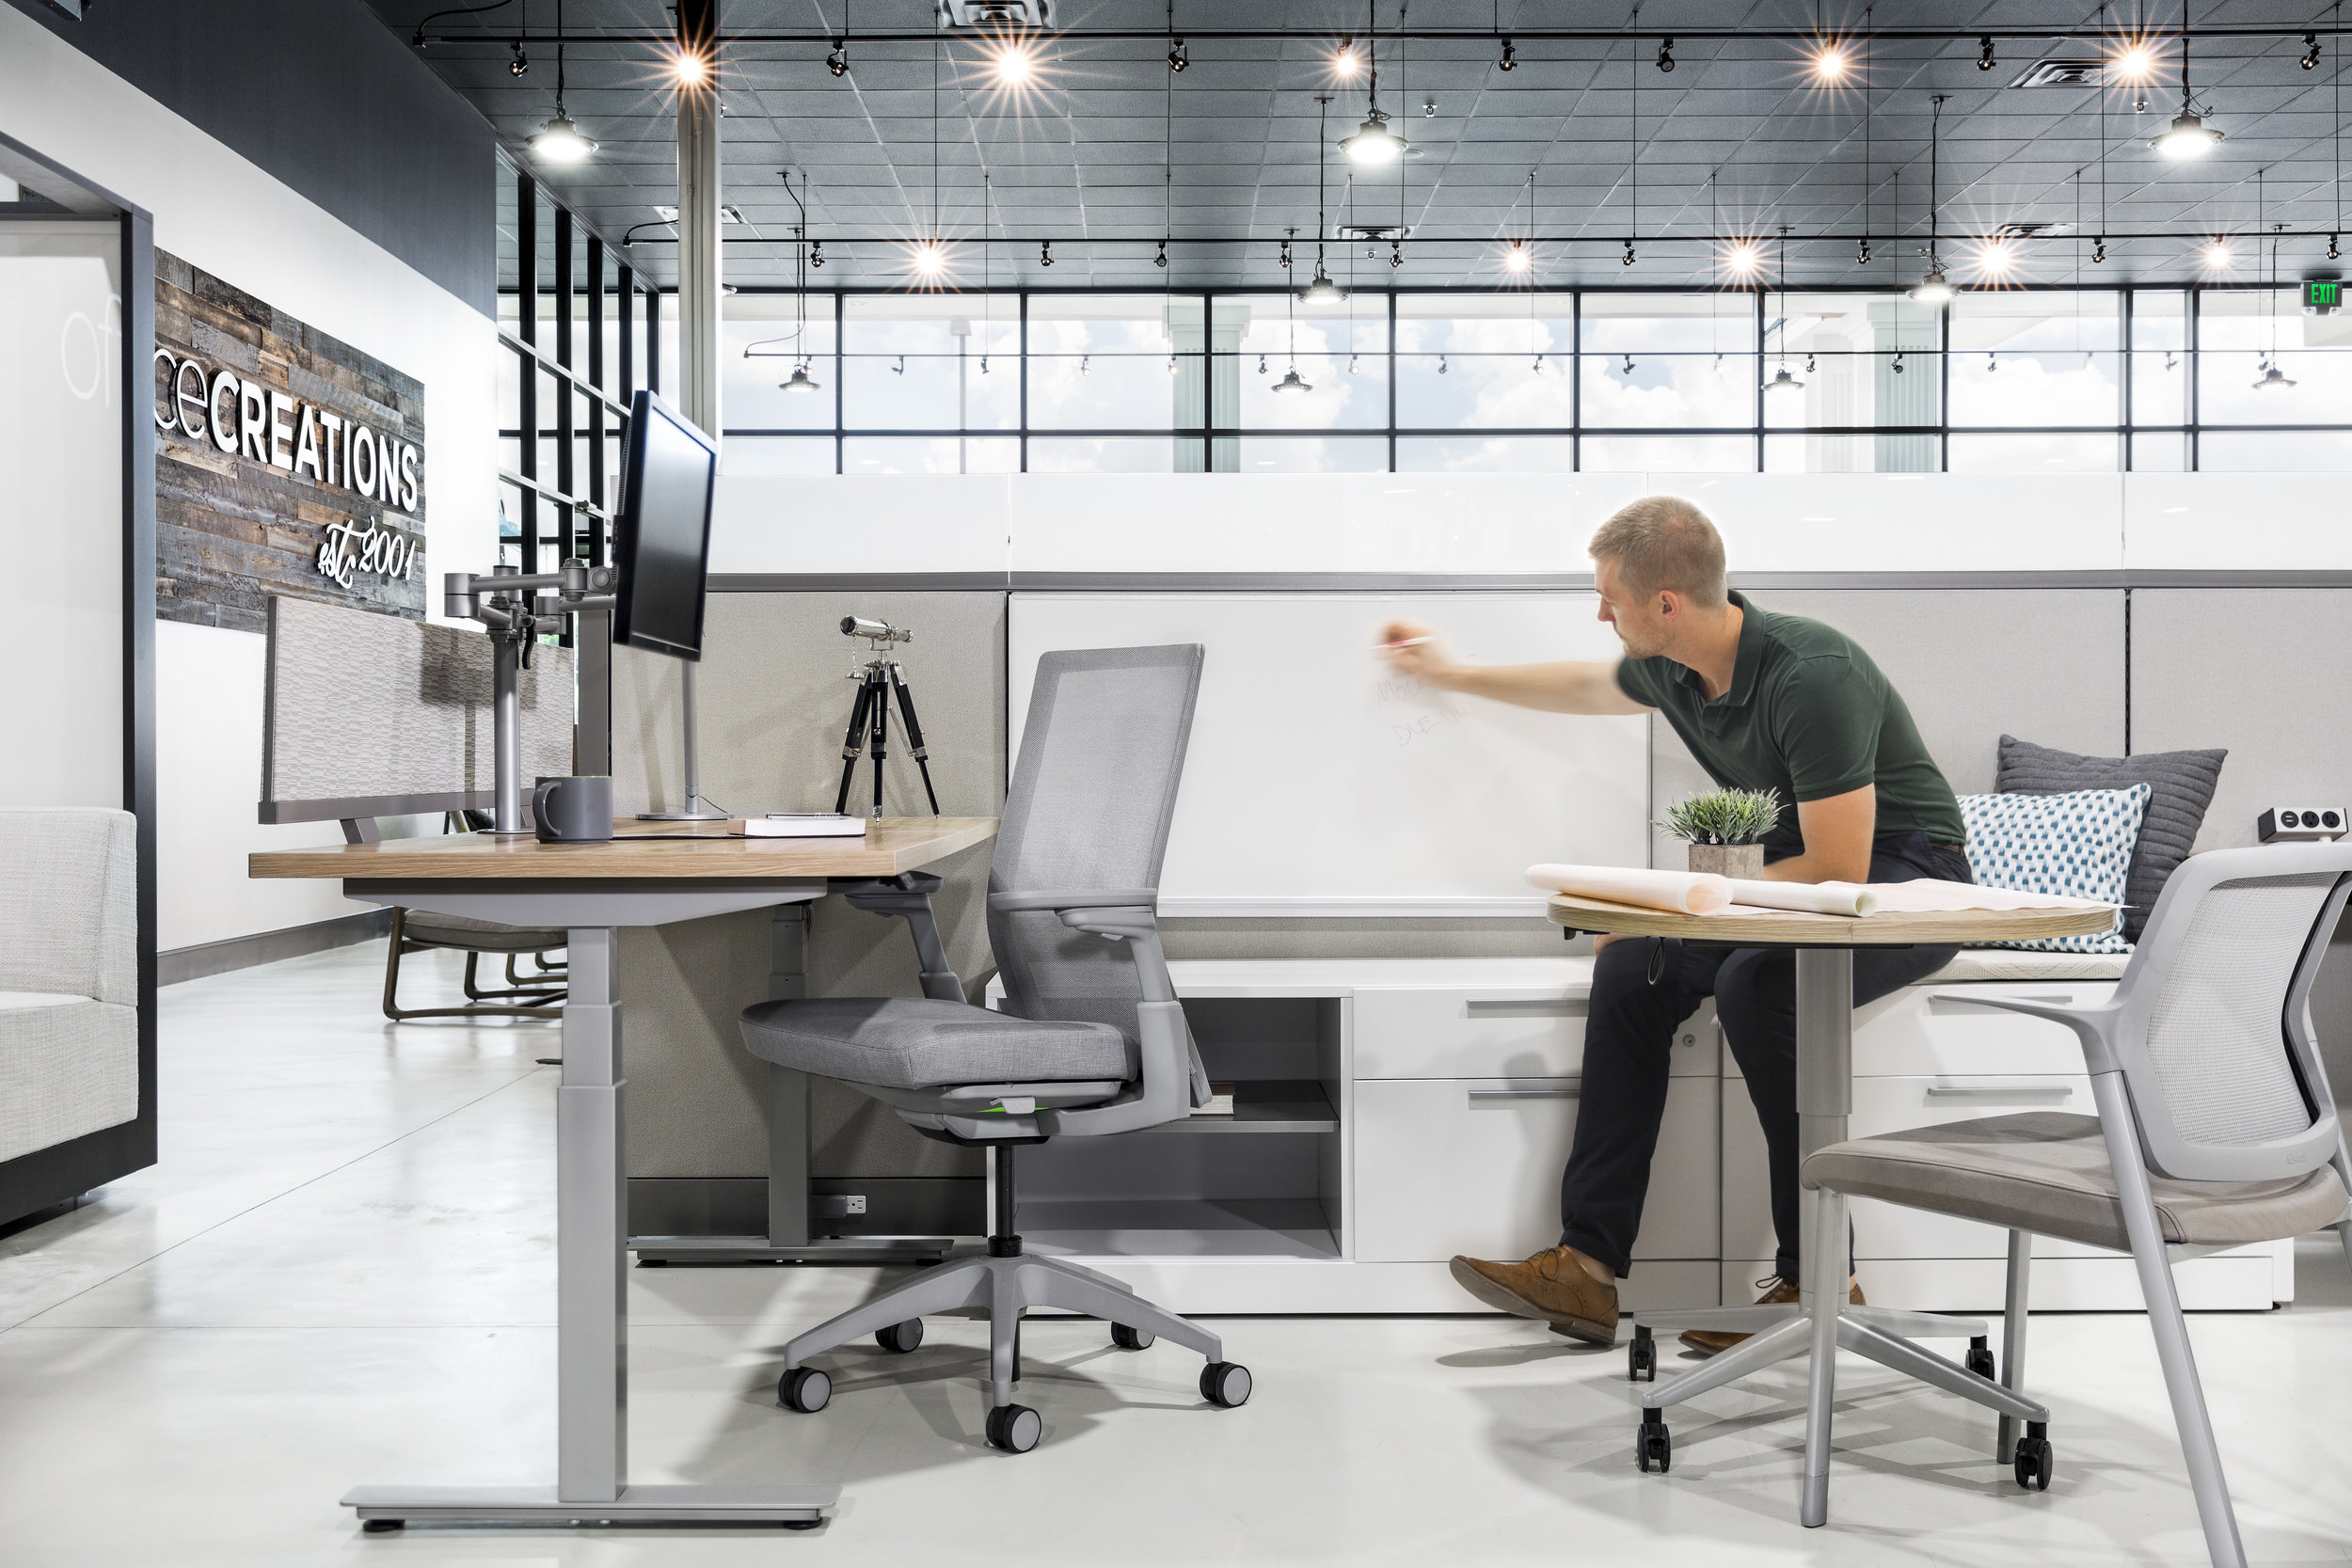 Allsteel_OfficeCreations_Composites_Workstations_03_people.jpg